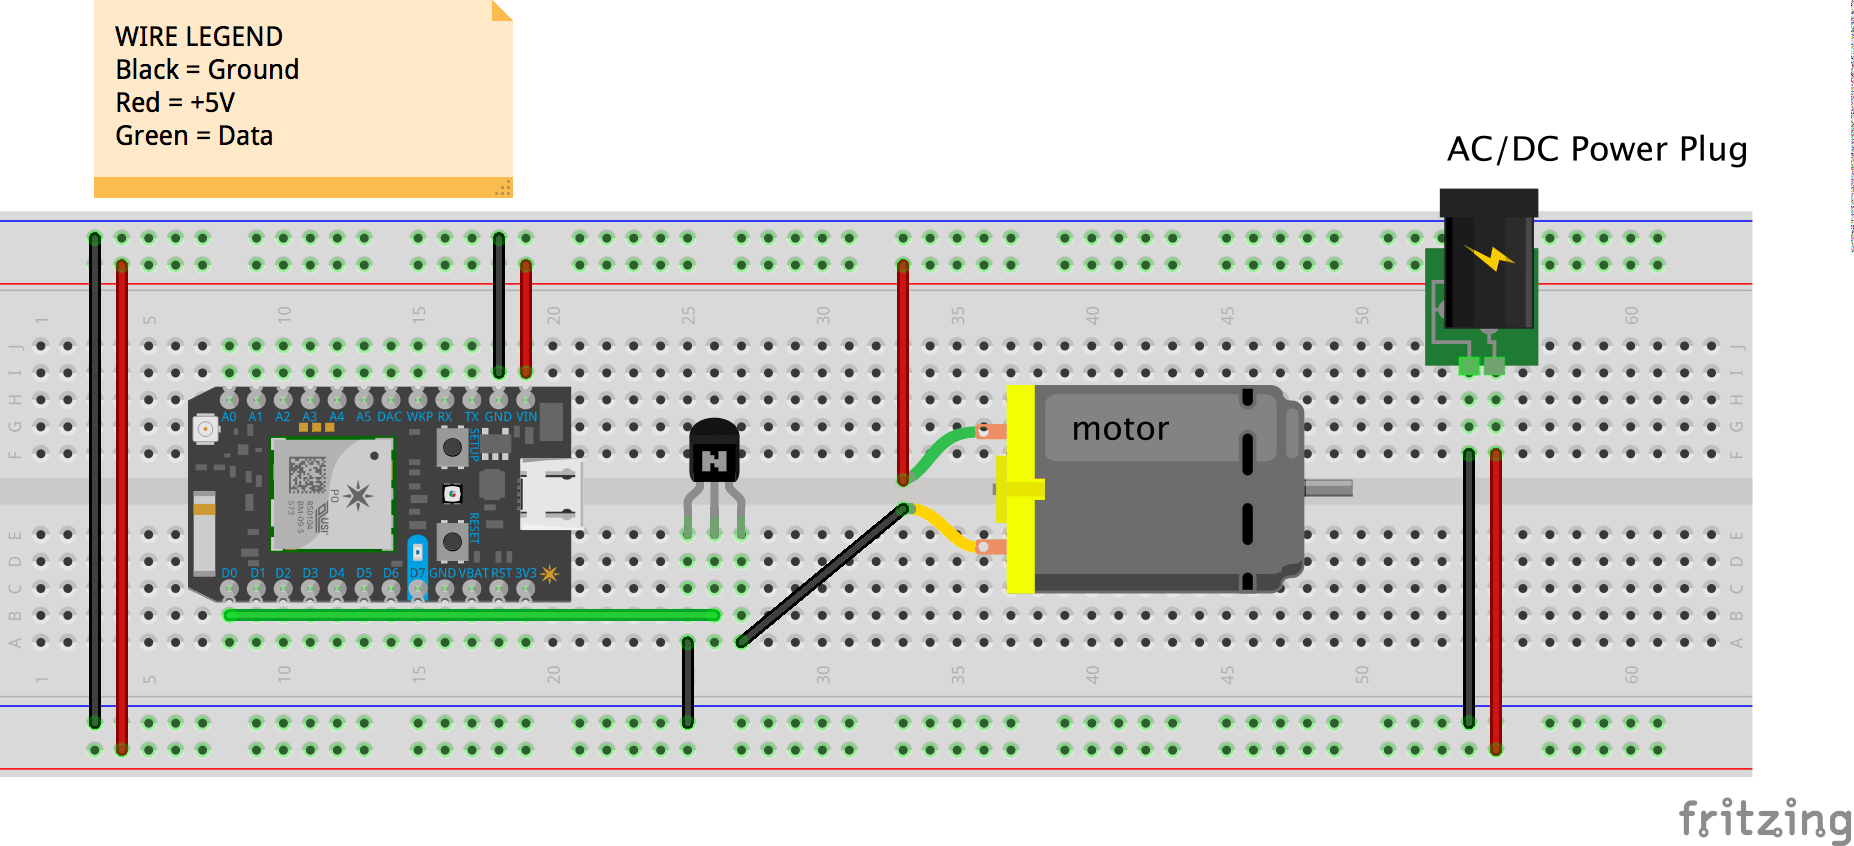 Diy Led Bubble Tube Part 5motor Control Morphatic Traffic Light Breadboard Diagram Wiring For Motor